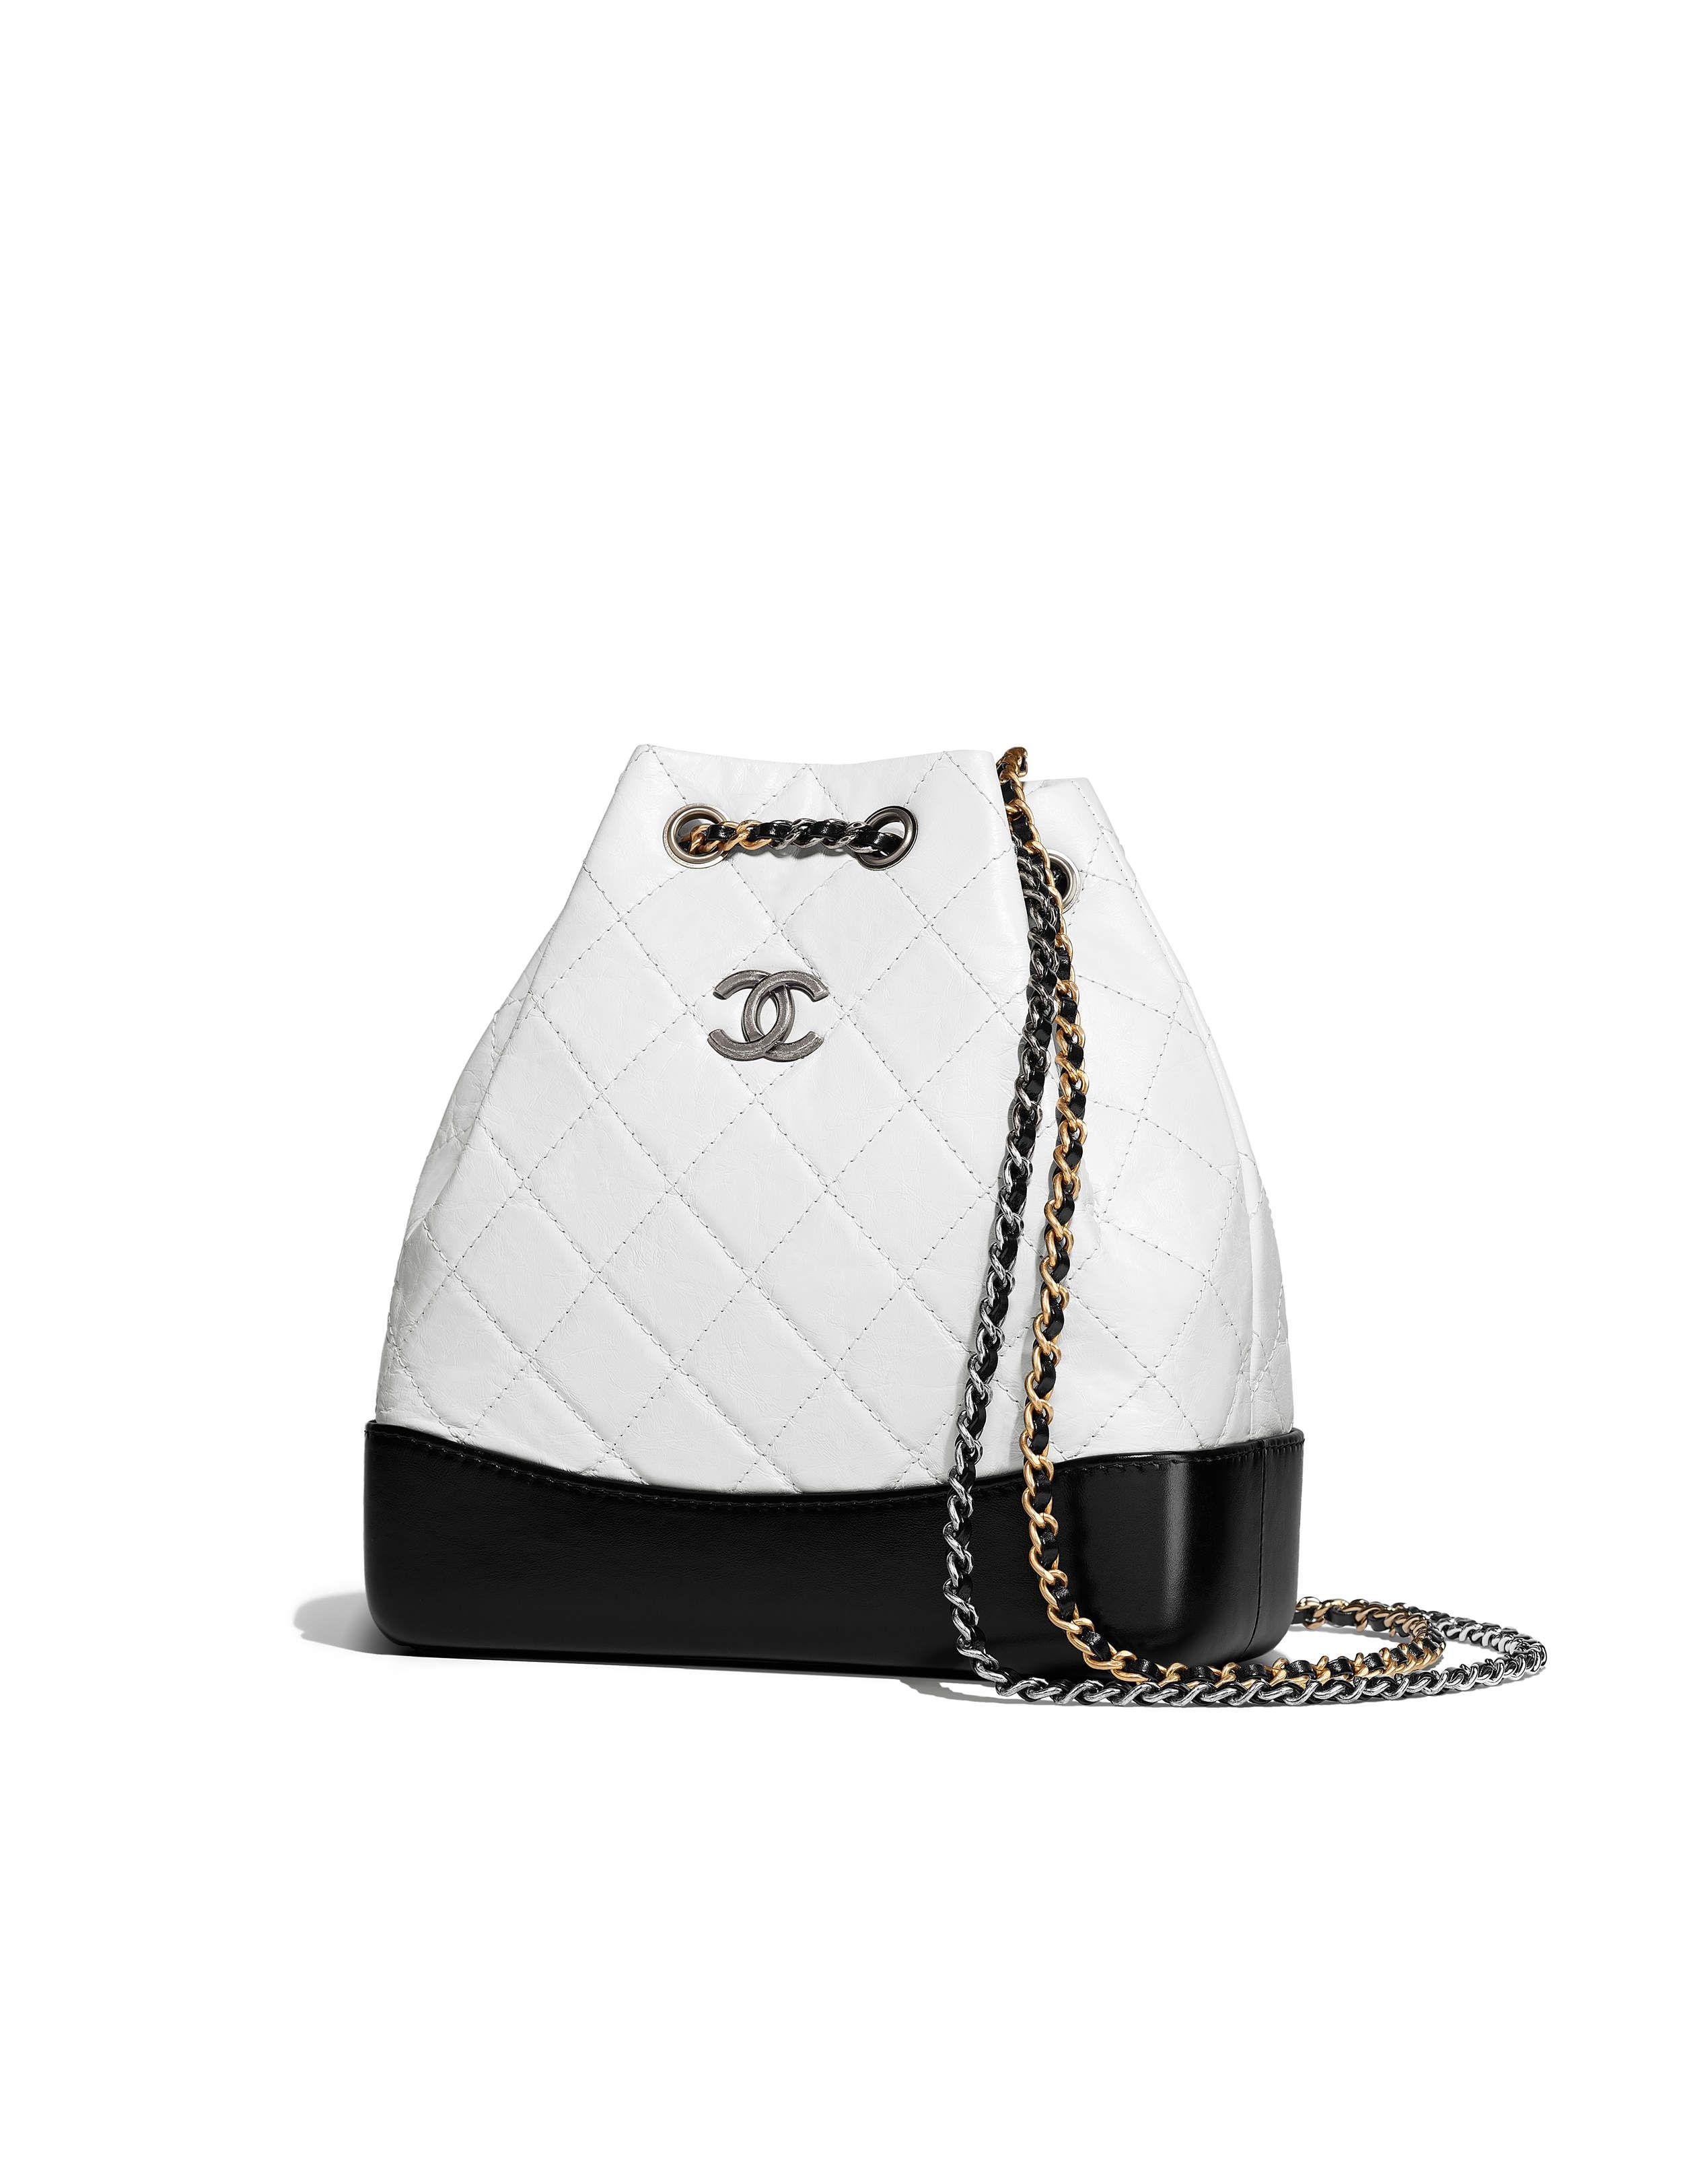 05d2b99f0e5ac4 Chanel - FW 2017/2018 | Chanel's Gabrielle backpack | BAGS | Fashion ...